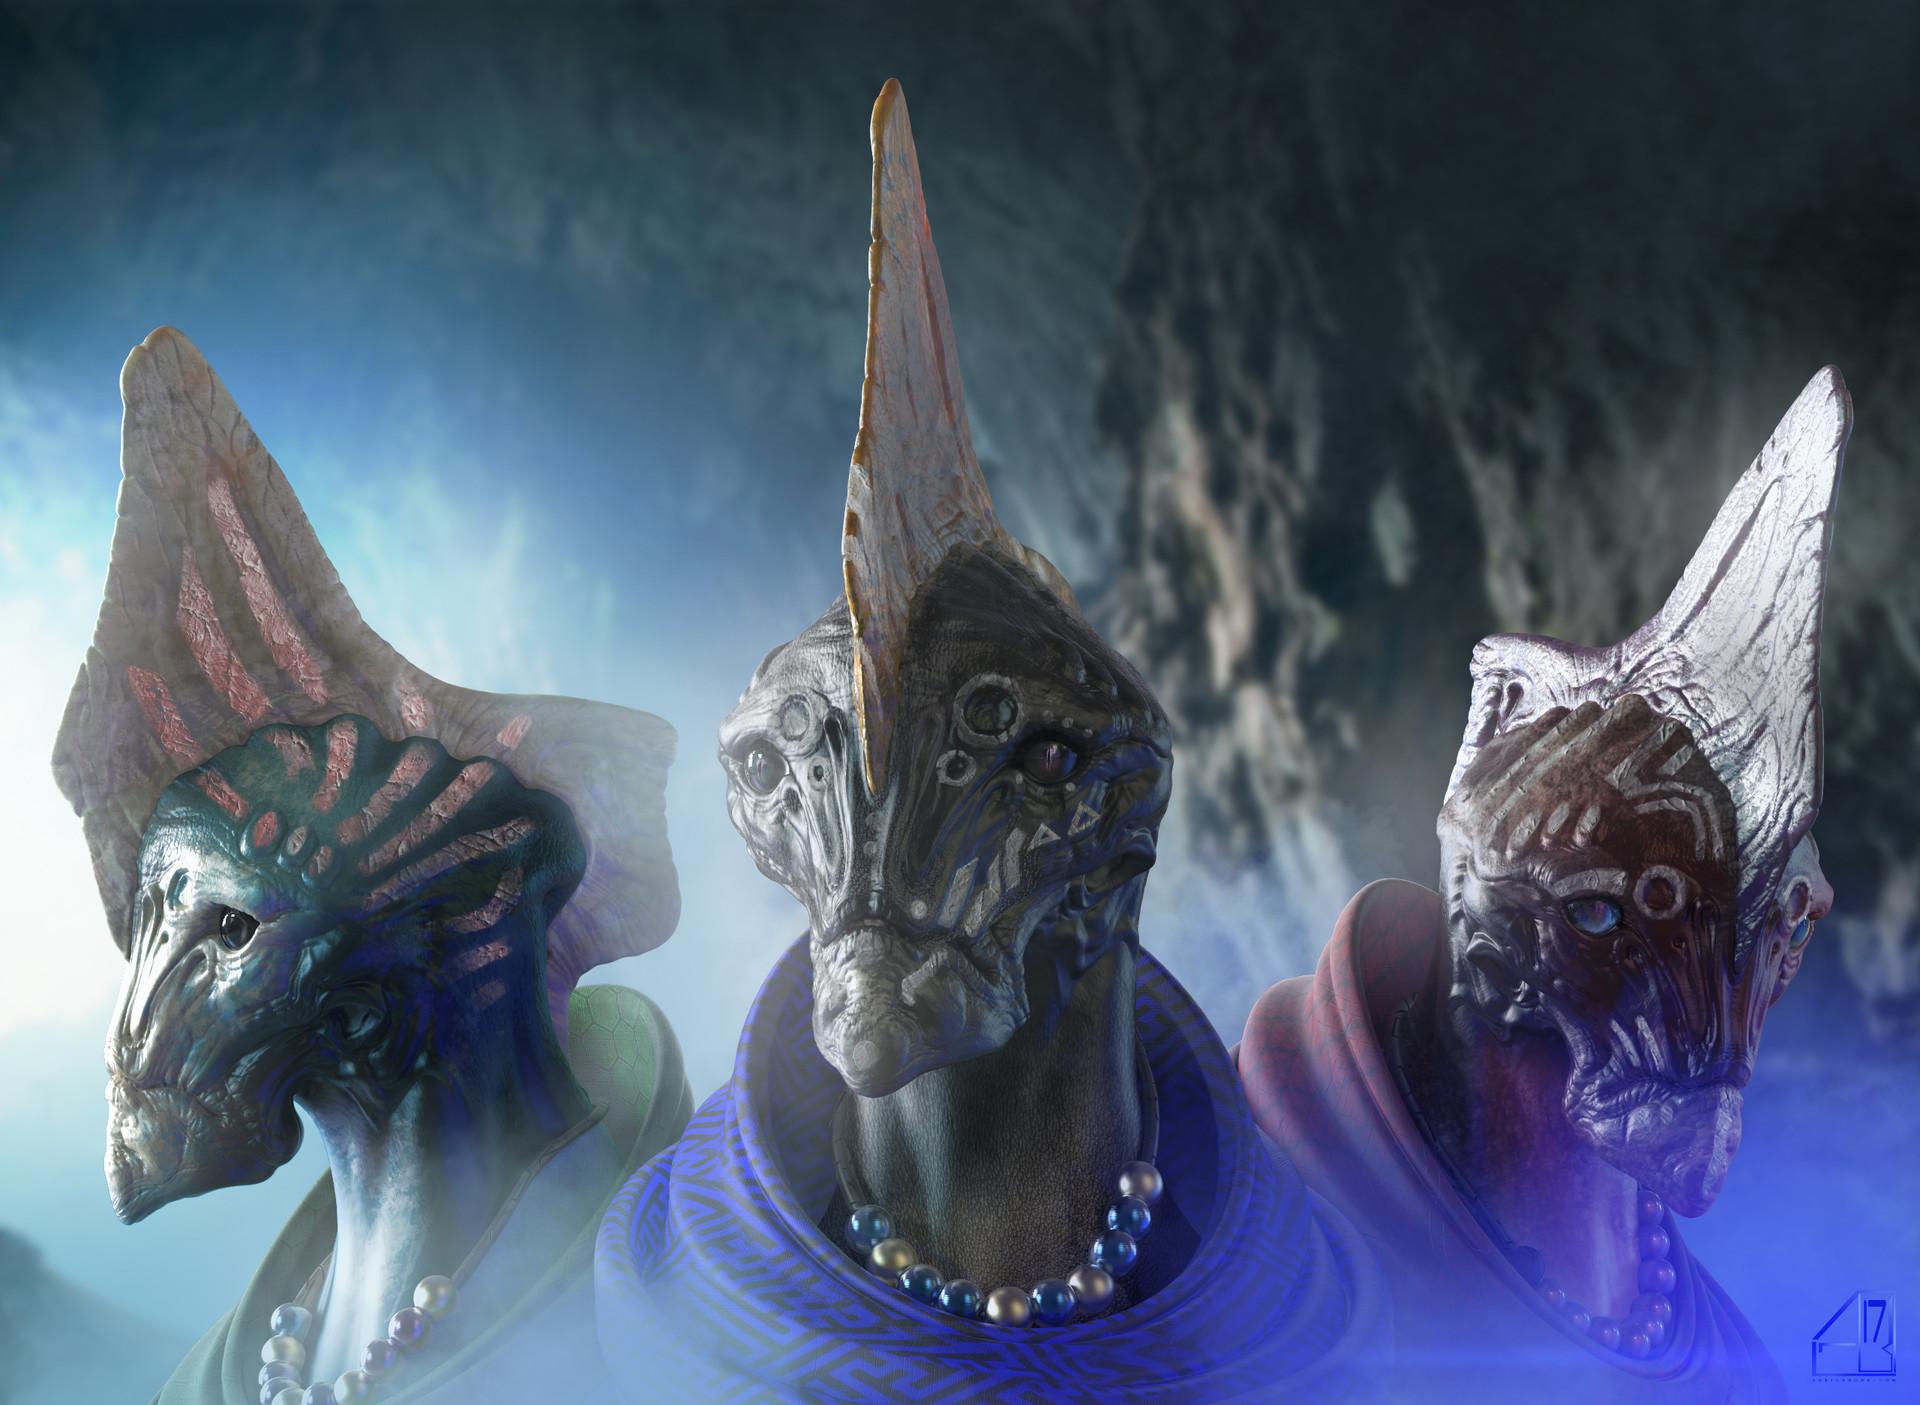 The Matriarchs alien concept by Adrian Bobb